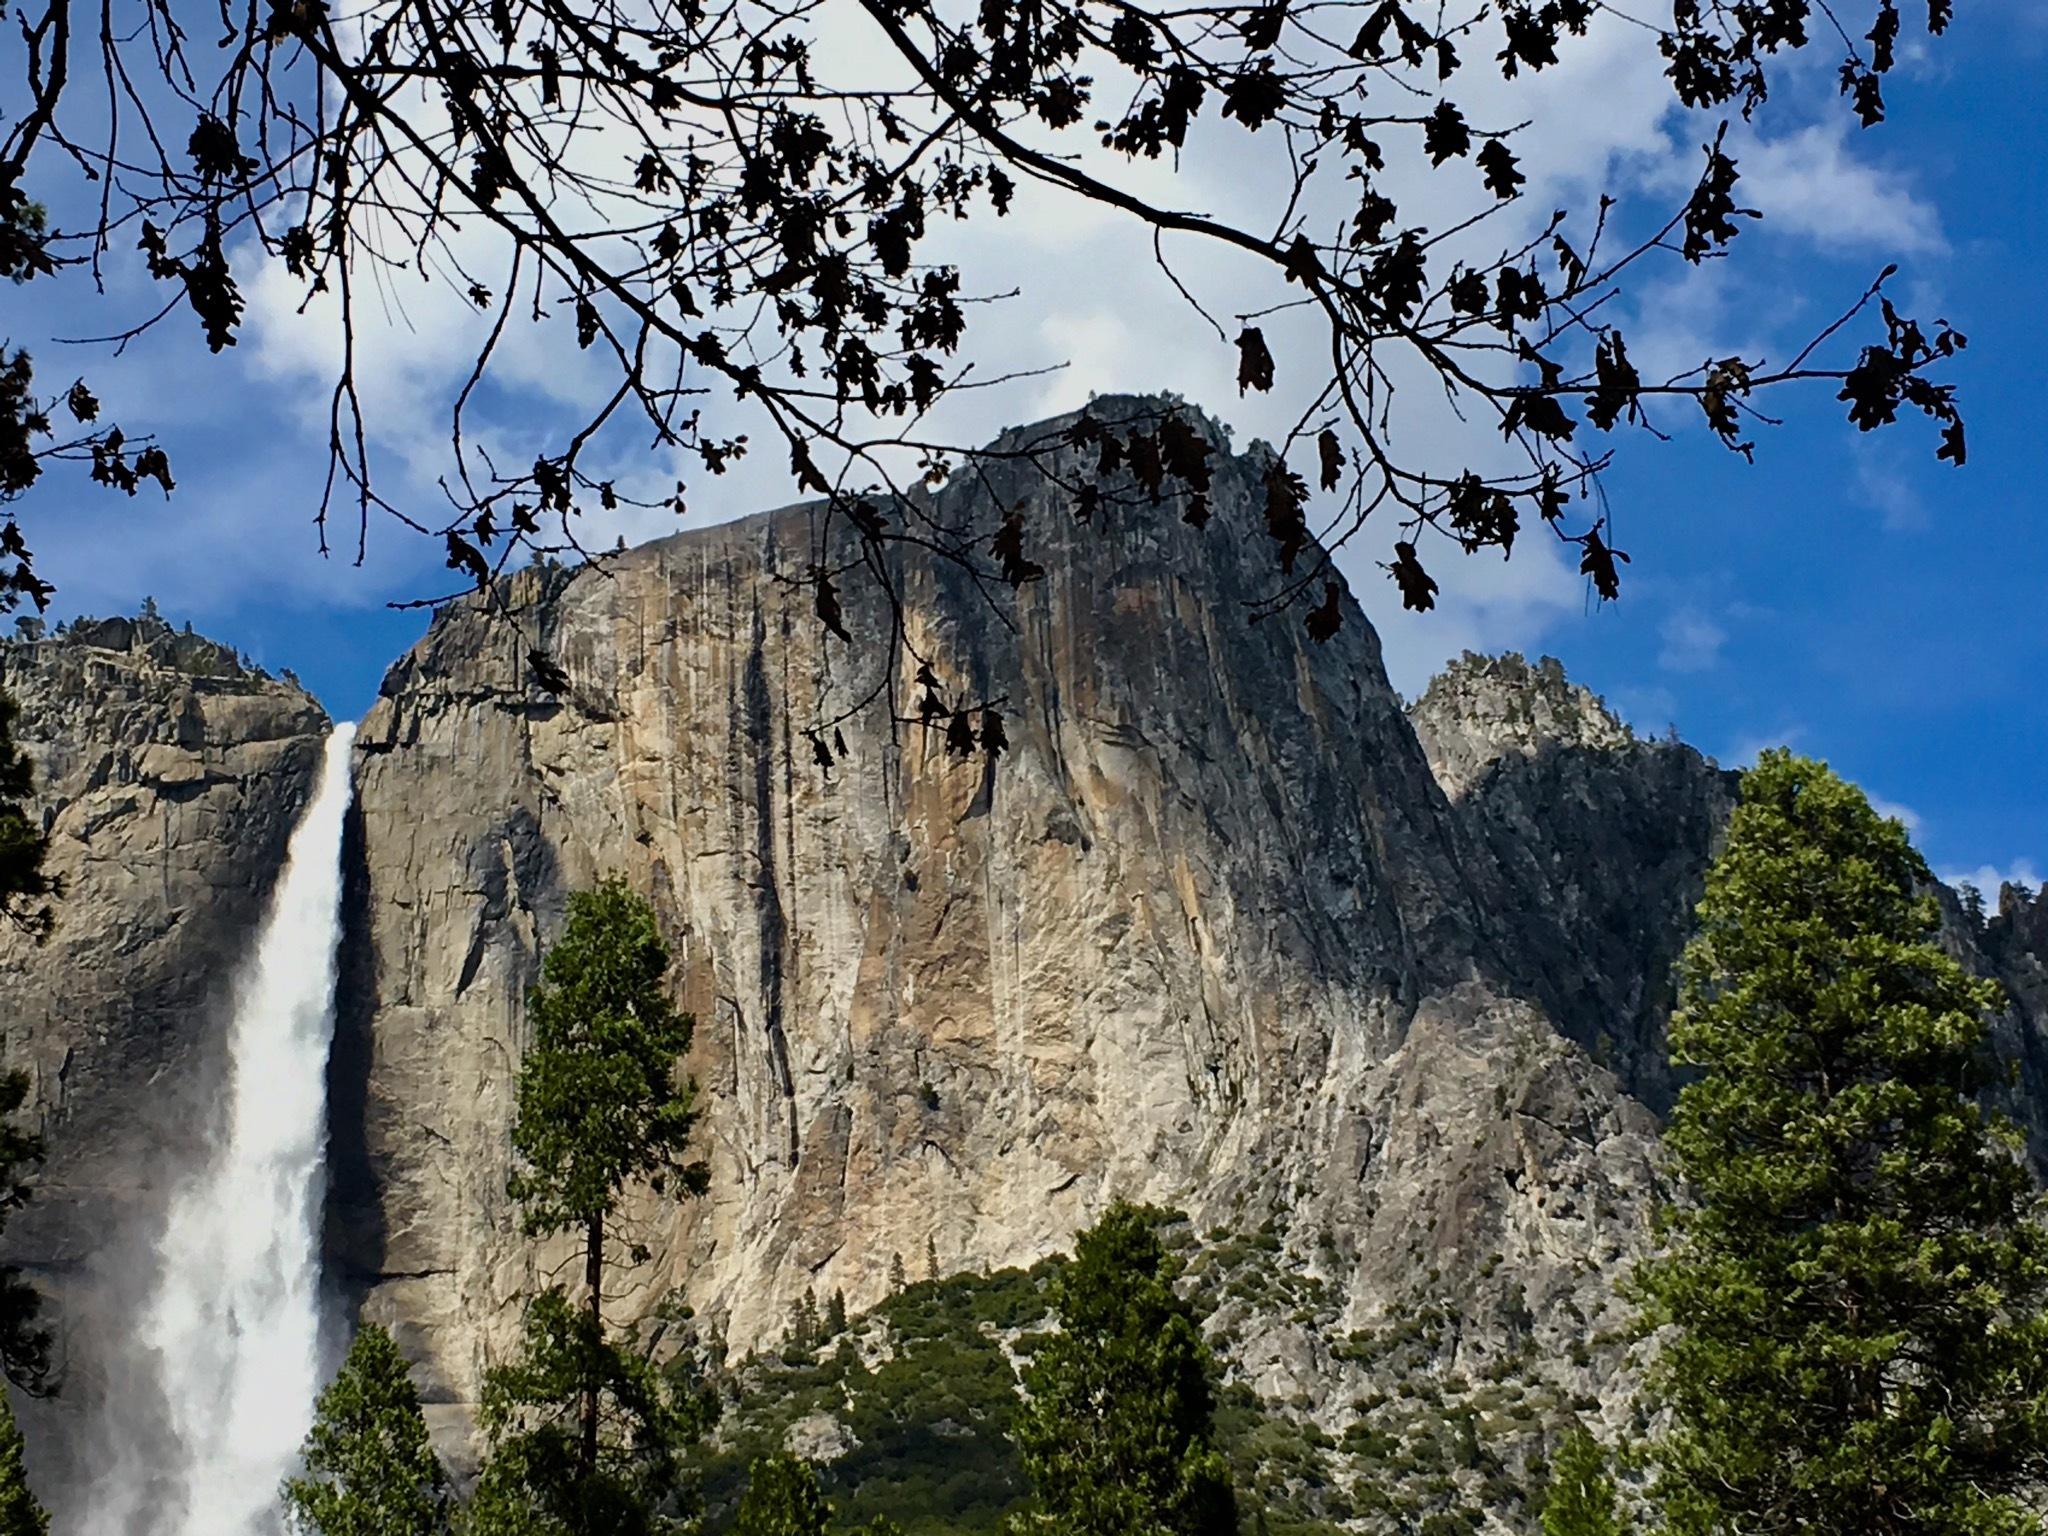 Yosemite National Park USA  by Kiran bhatt